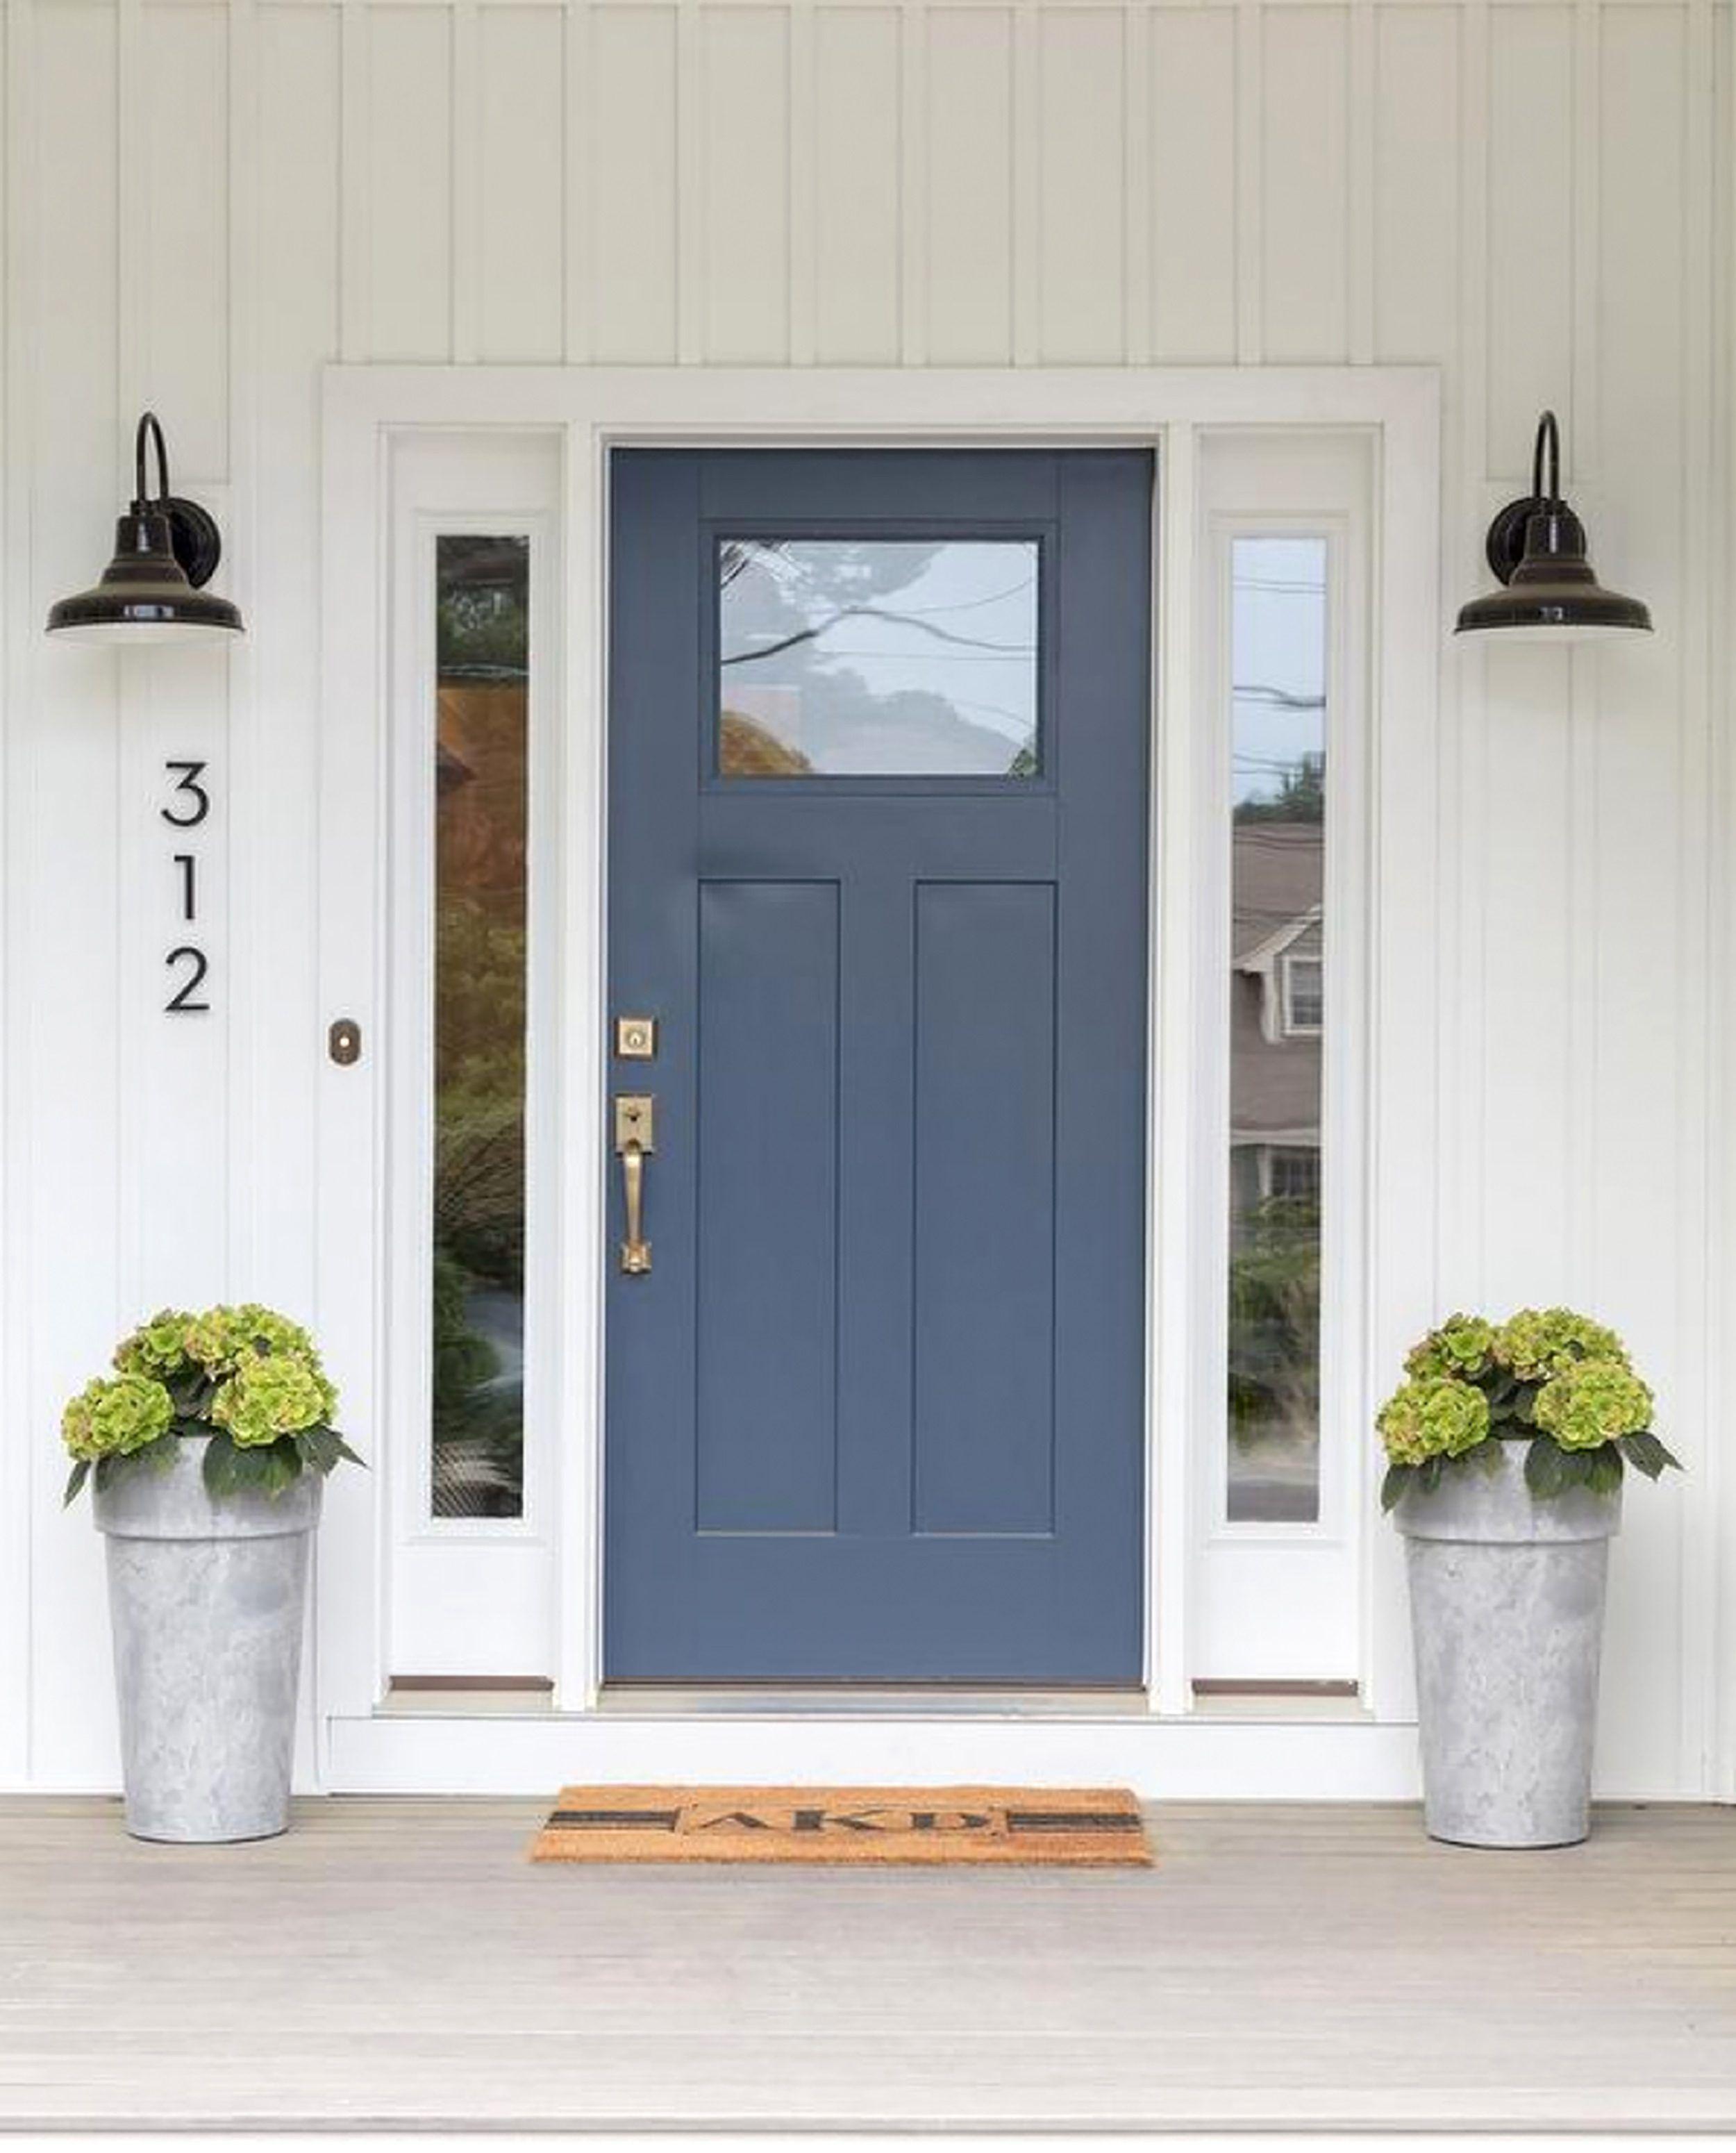 Portland Fixer Upper Inspirations For Front Door Colors Puertas De Colores Puertas De Entrada De Madera Fachada De Casa